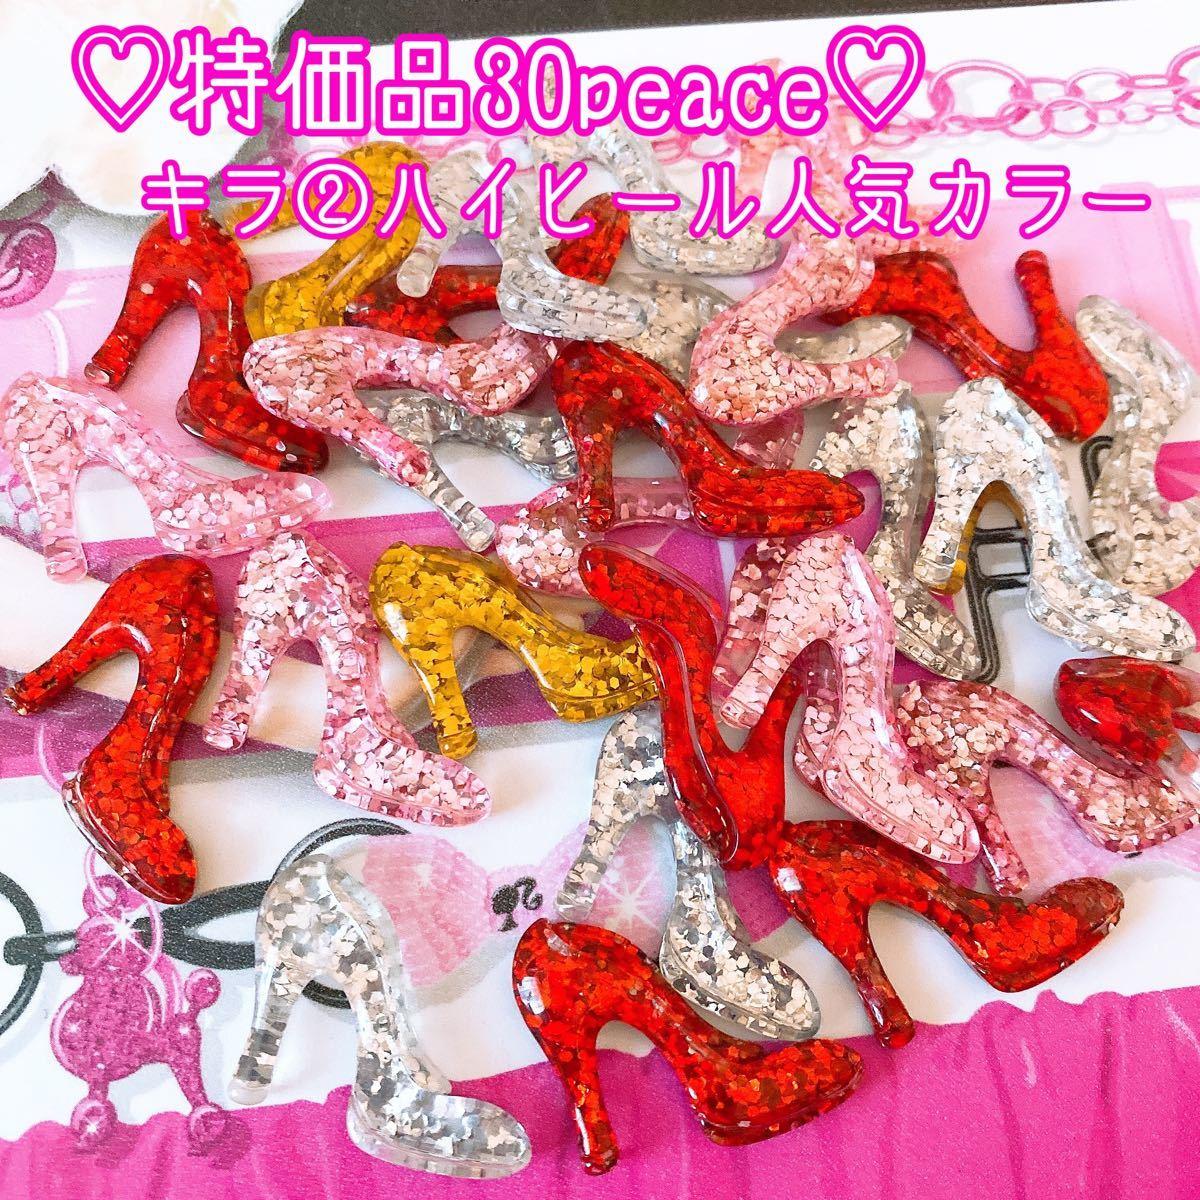 New特価品★キラキラホログラムハイヒール★人気カラー30peace デコパーツ